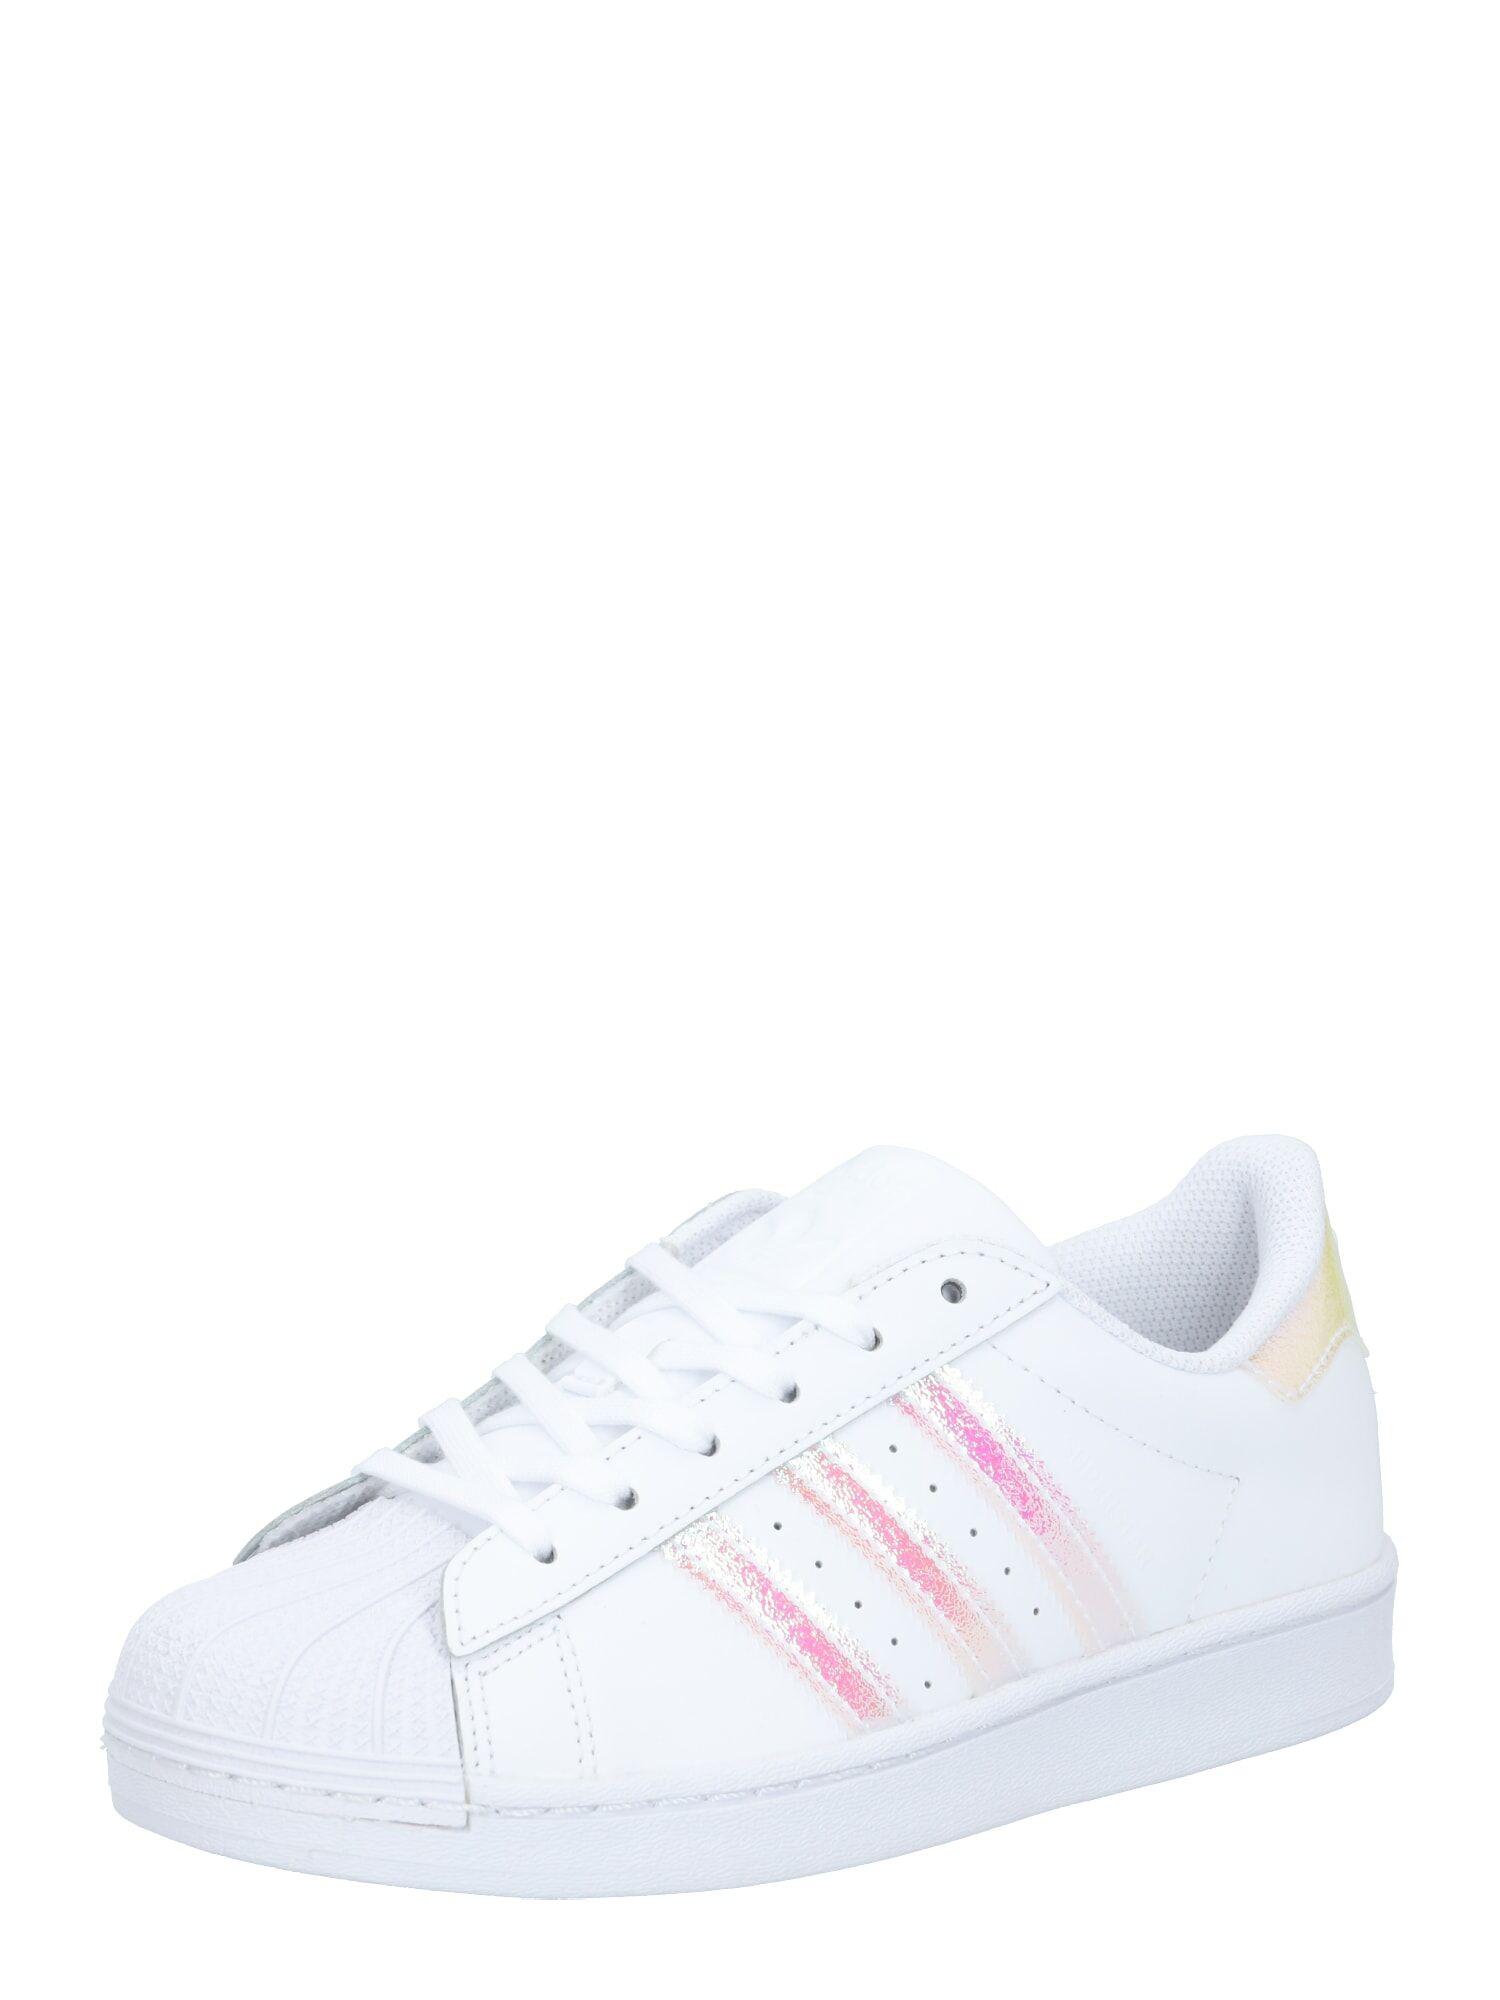 ADIDAS ORIGINALS Sneaker 'Superstar C' Bianco